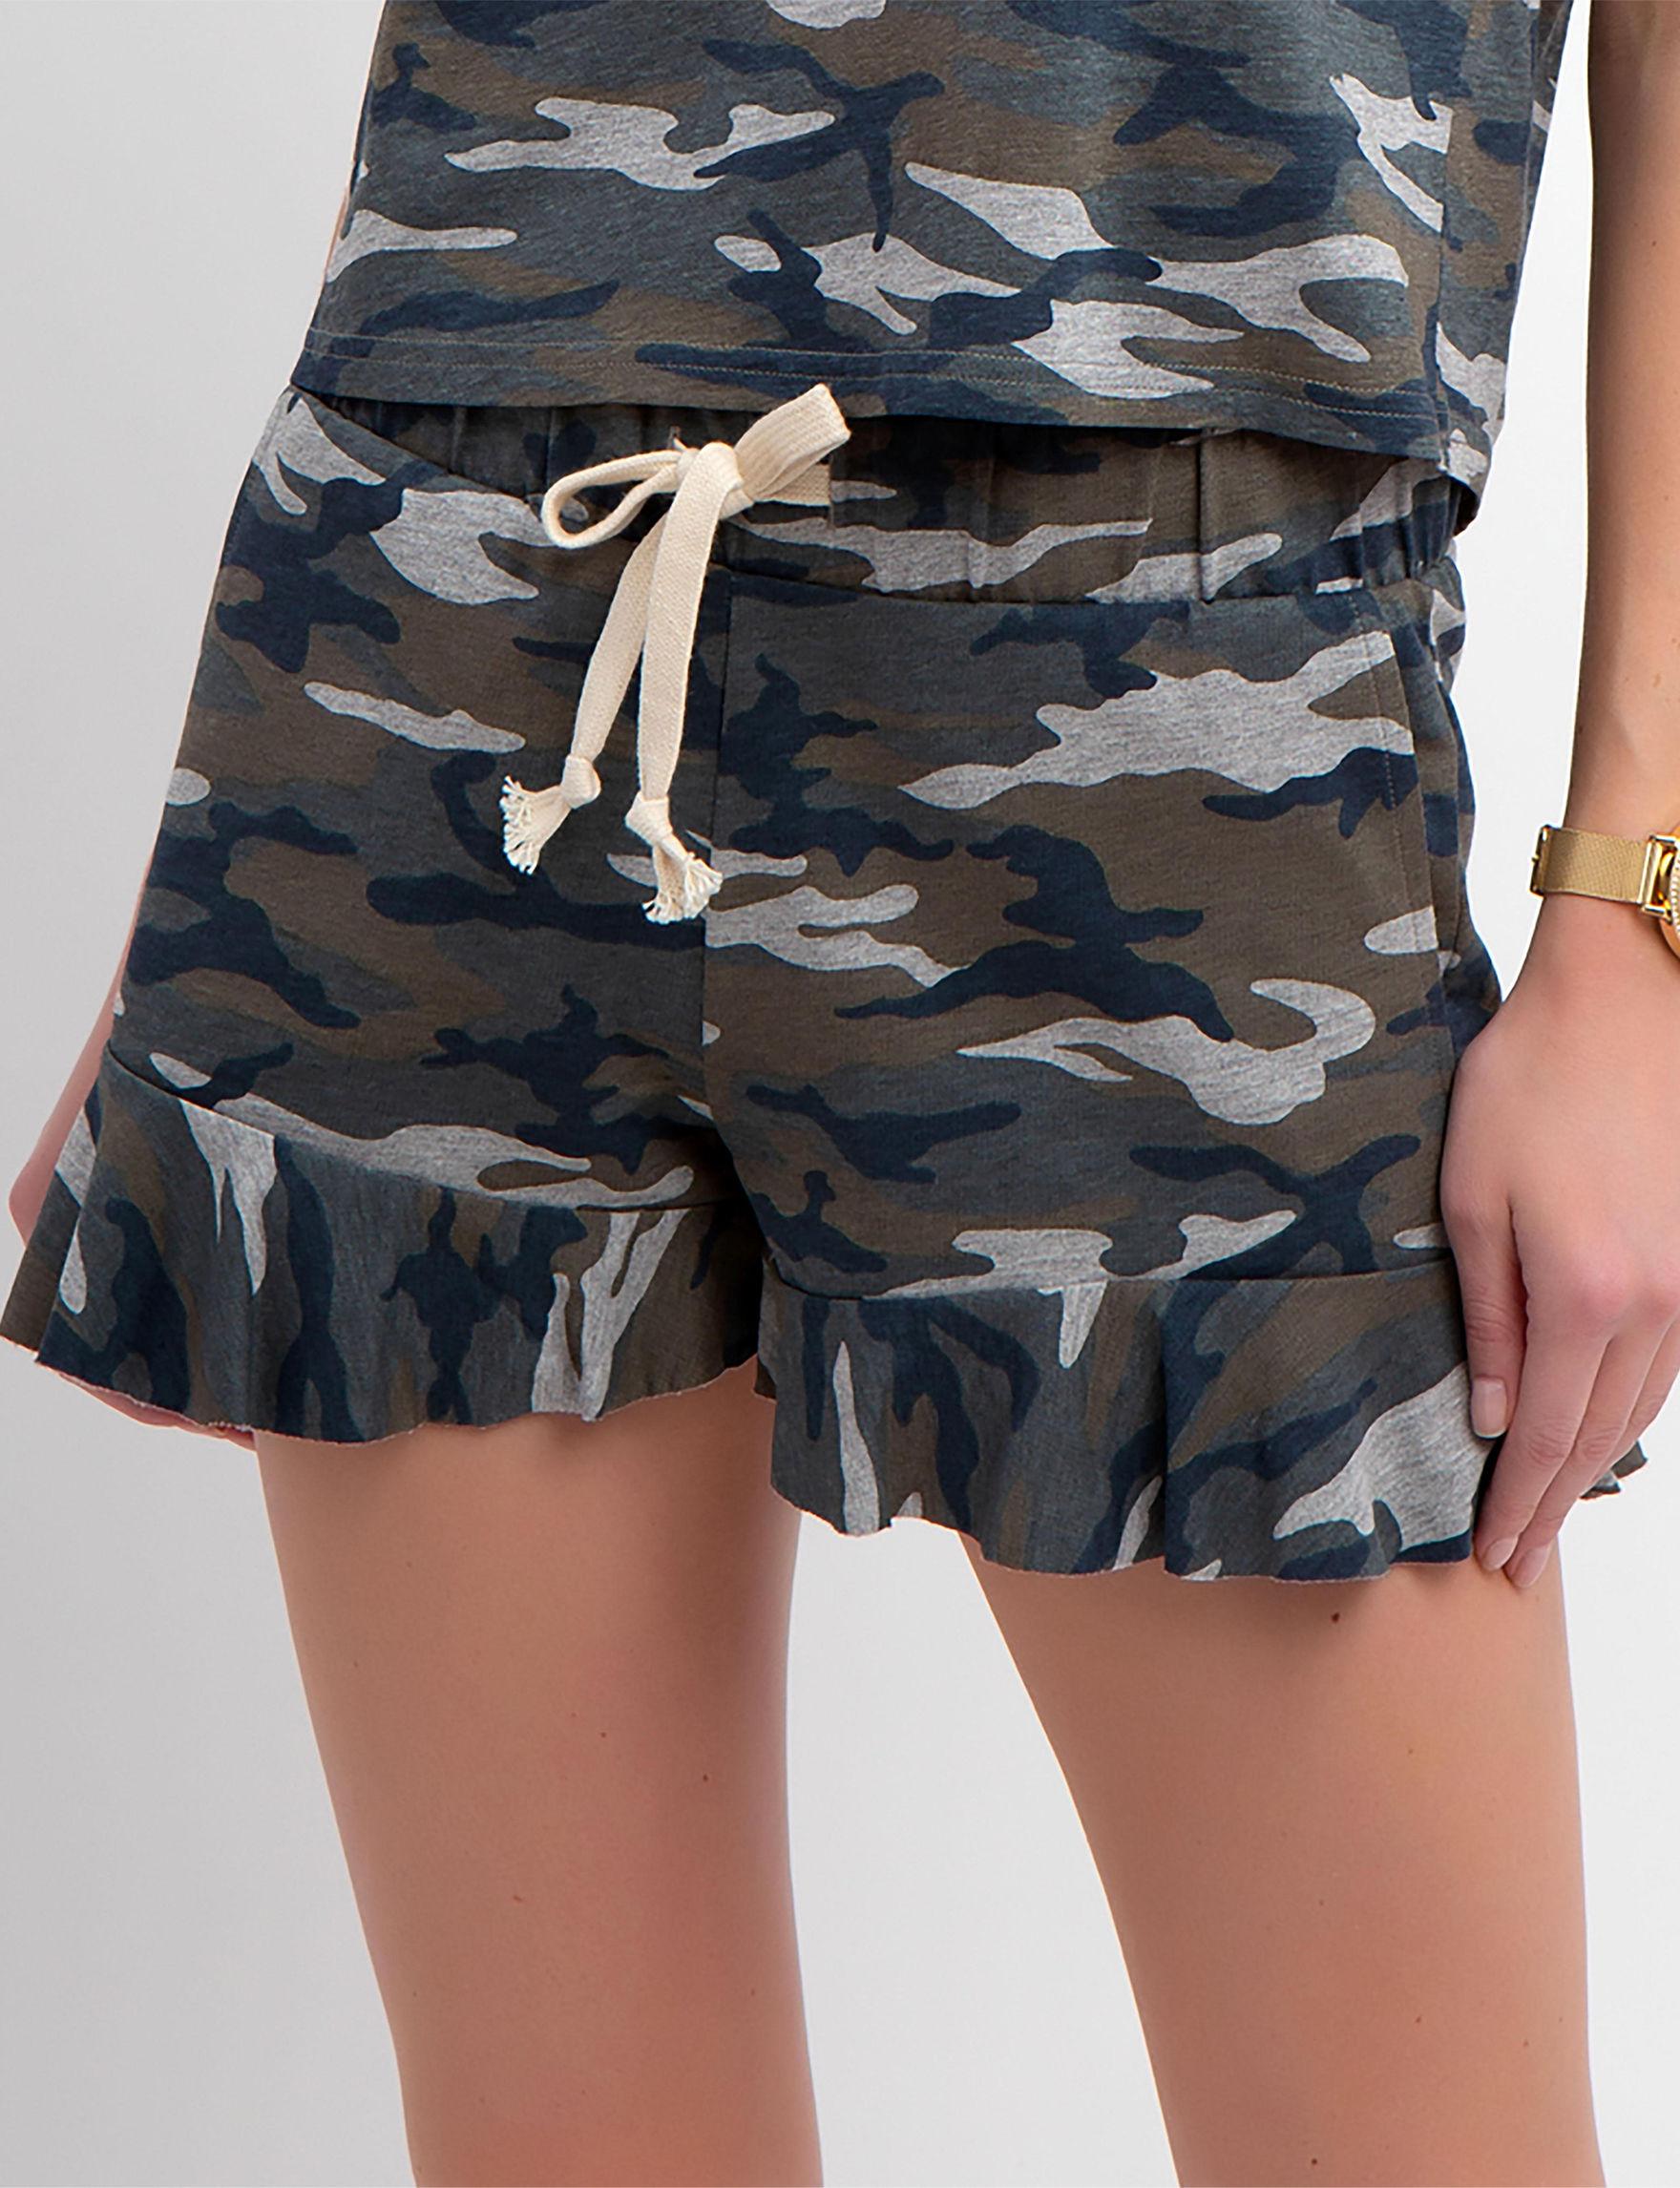 U.S. Polo Assn. Heather Grey / Camo Soft Shorts